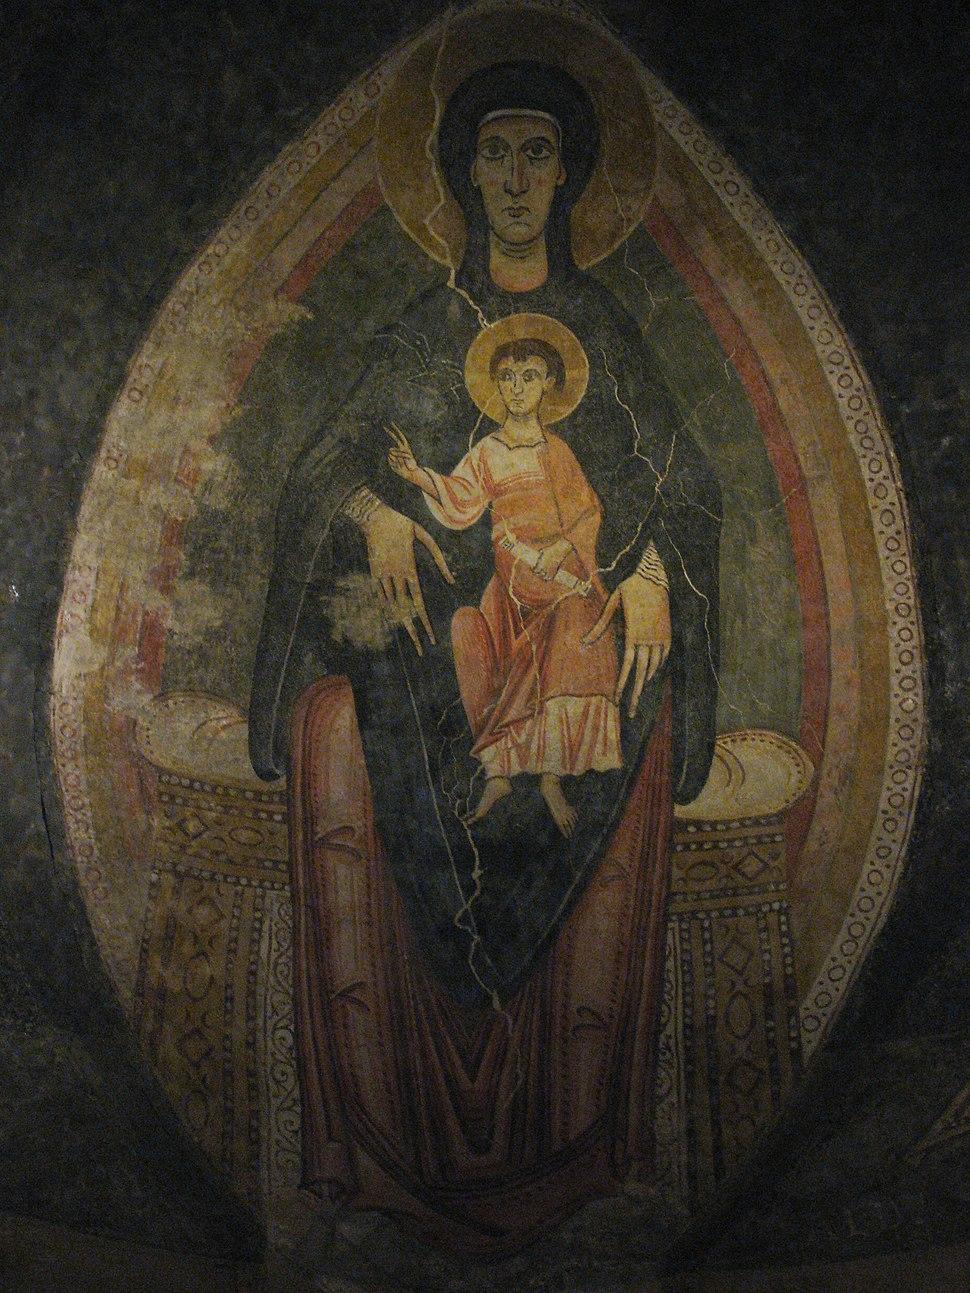 Crucifix, Spain, ca. 1150-1200; Virgin and Child in Majesty, Master of Pedret Catalunya, ca. 1100 (5459694198)